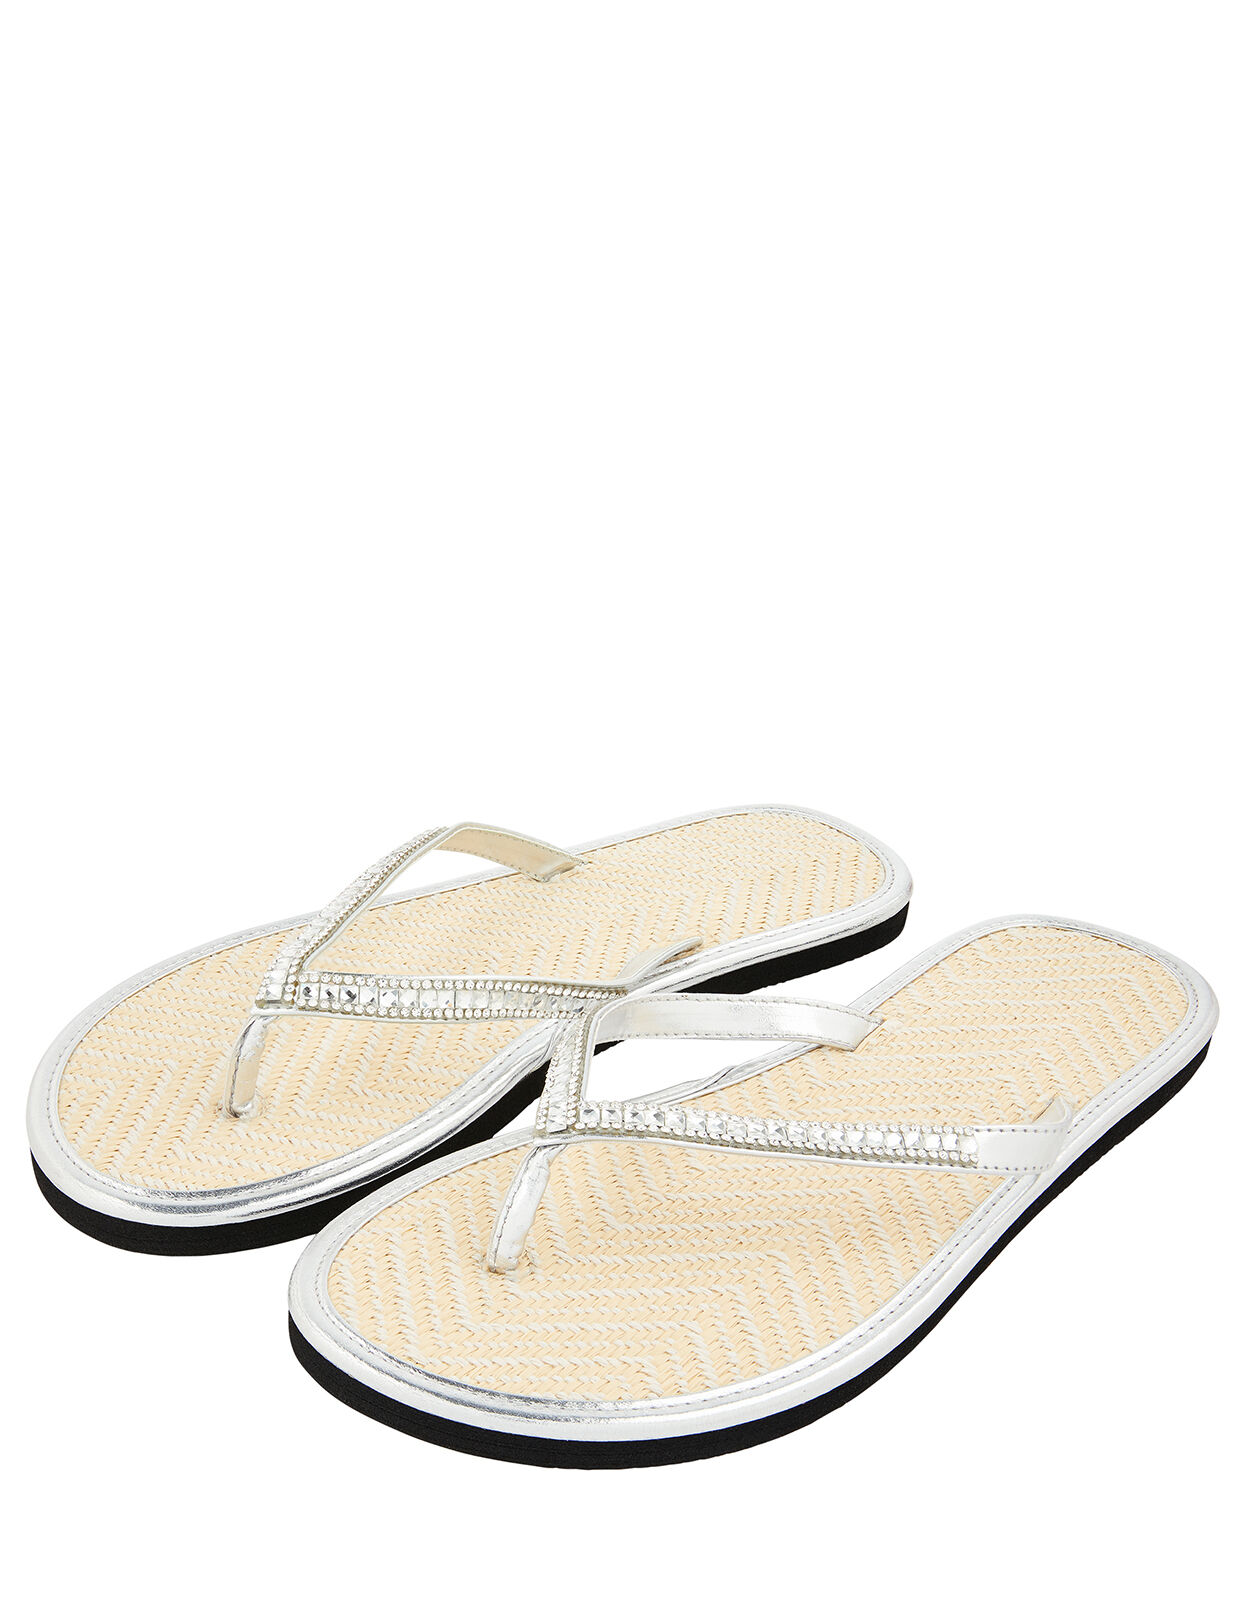 Sandals \u0026 Flip Flops | Shoes